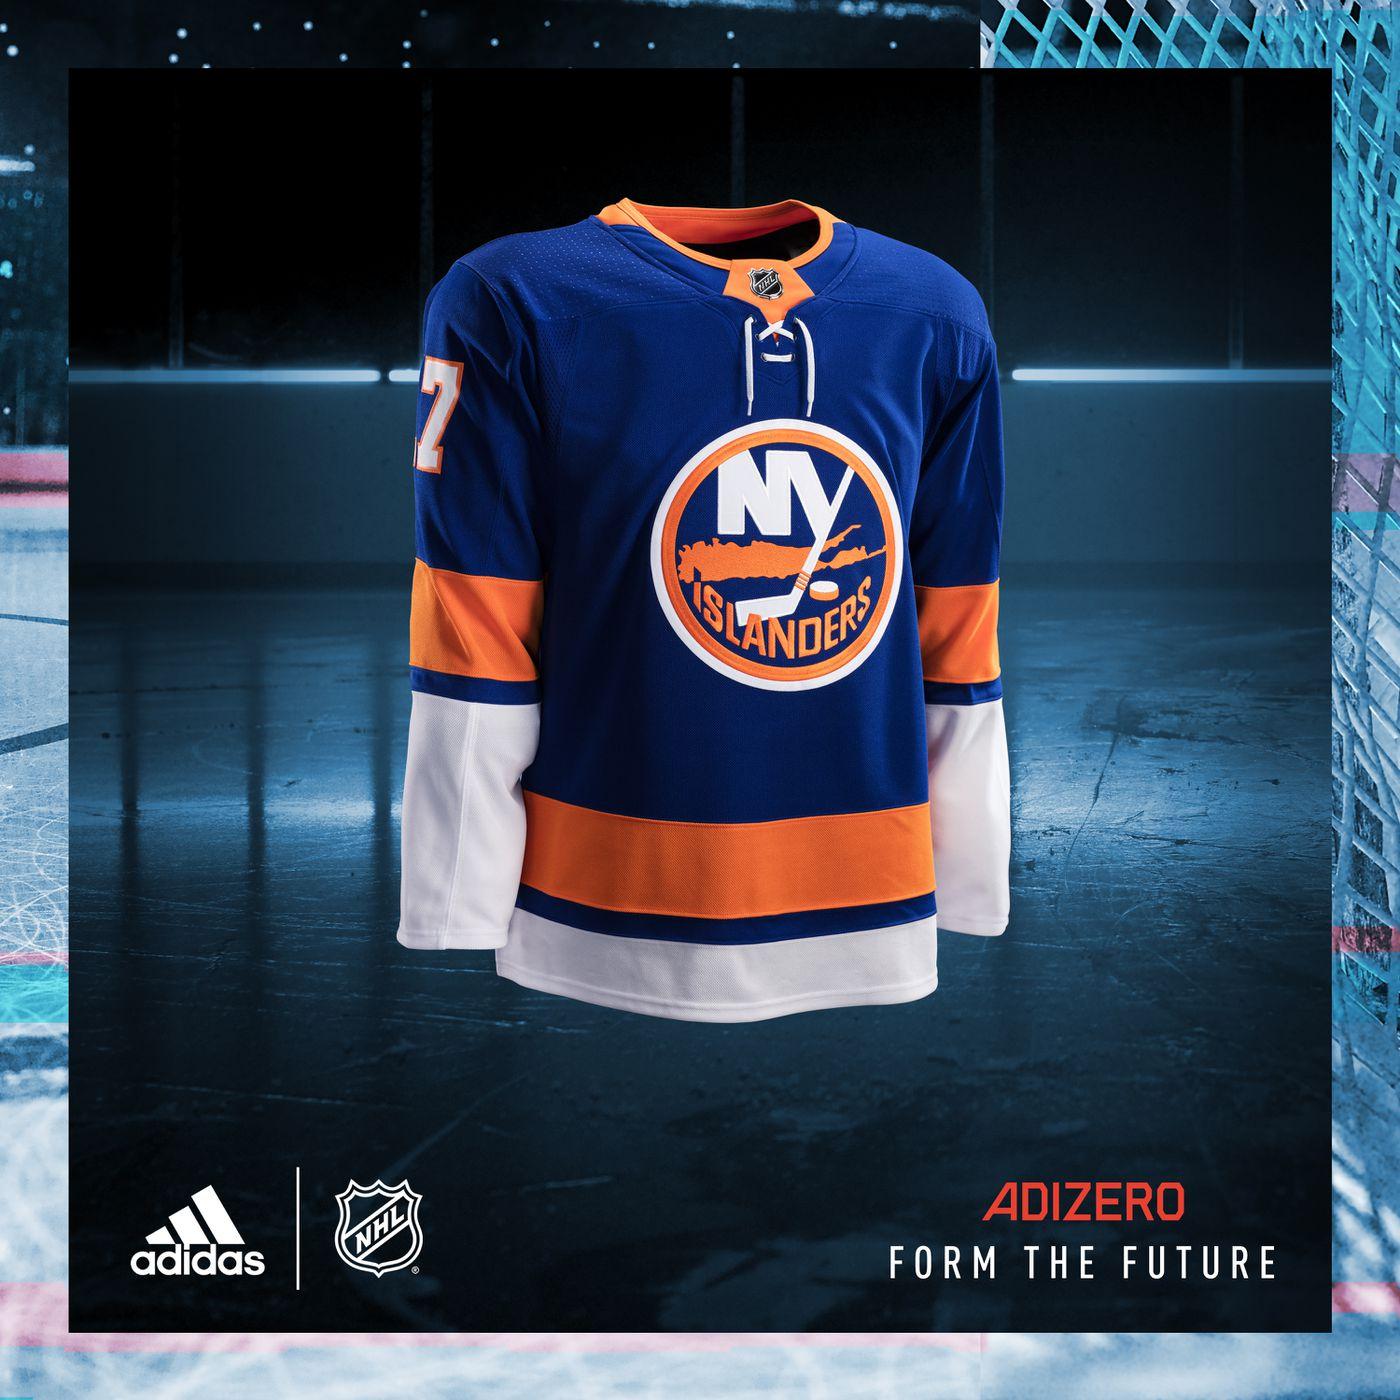 sale retailer e68d5 cd2ef Days of Future Past: New Adidas Islanders jersey looks like ...